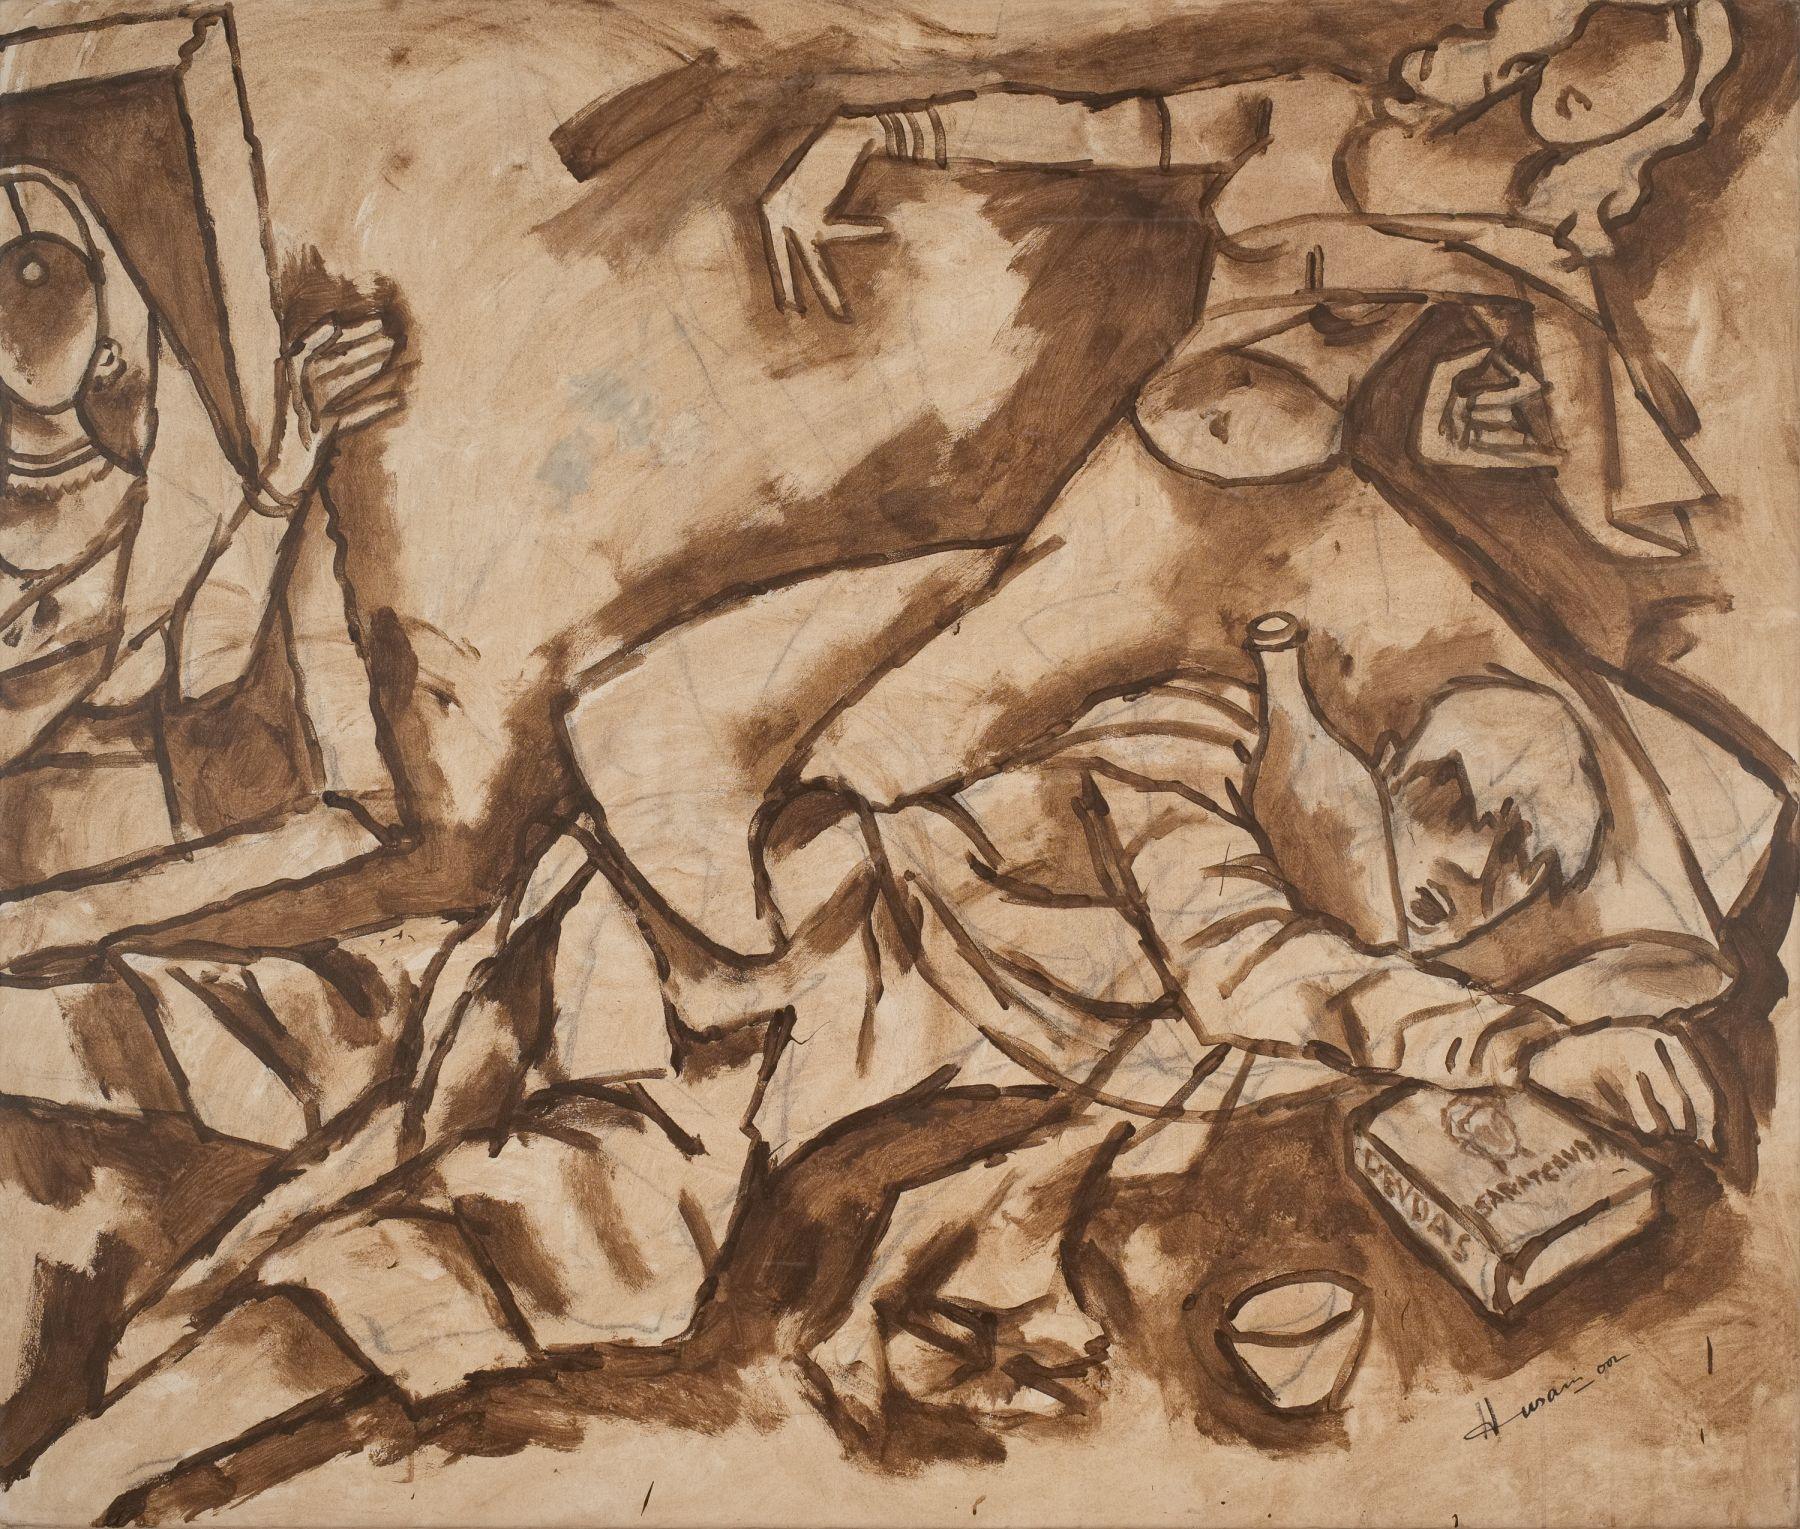 M. F. Husain   Devdas  2002  Acrylic on canvas  60 x 70 in